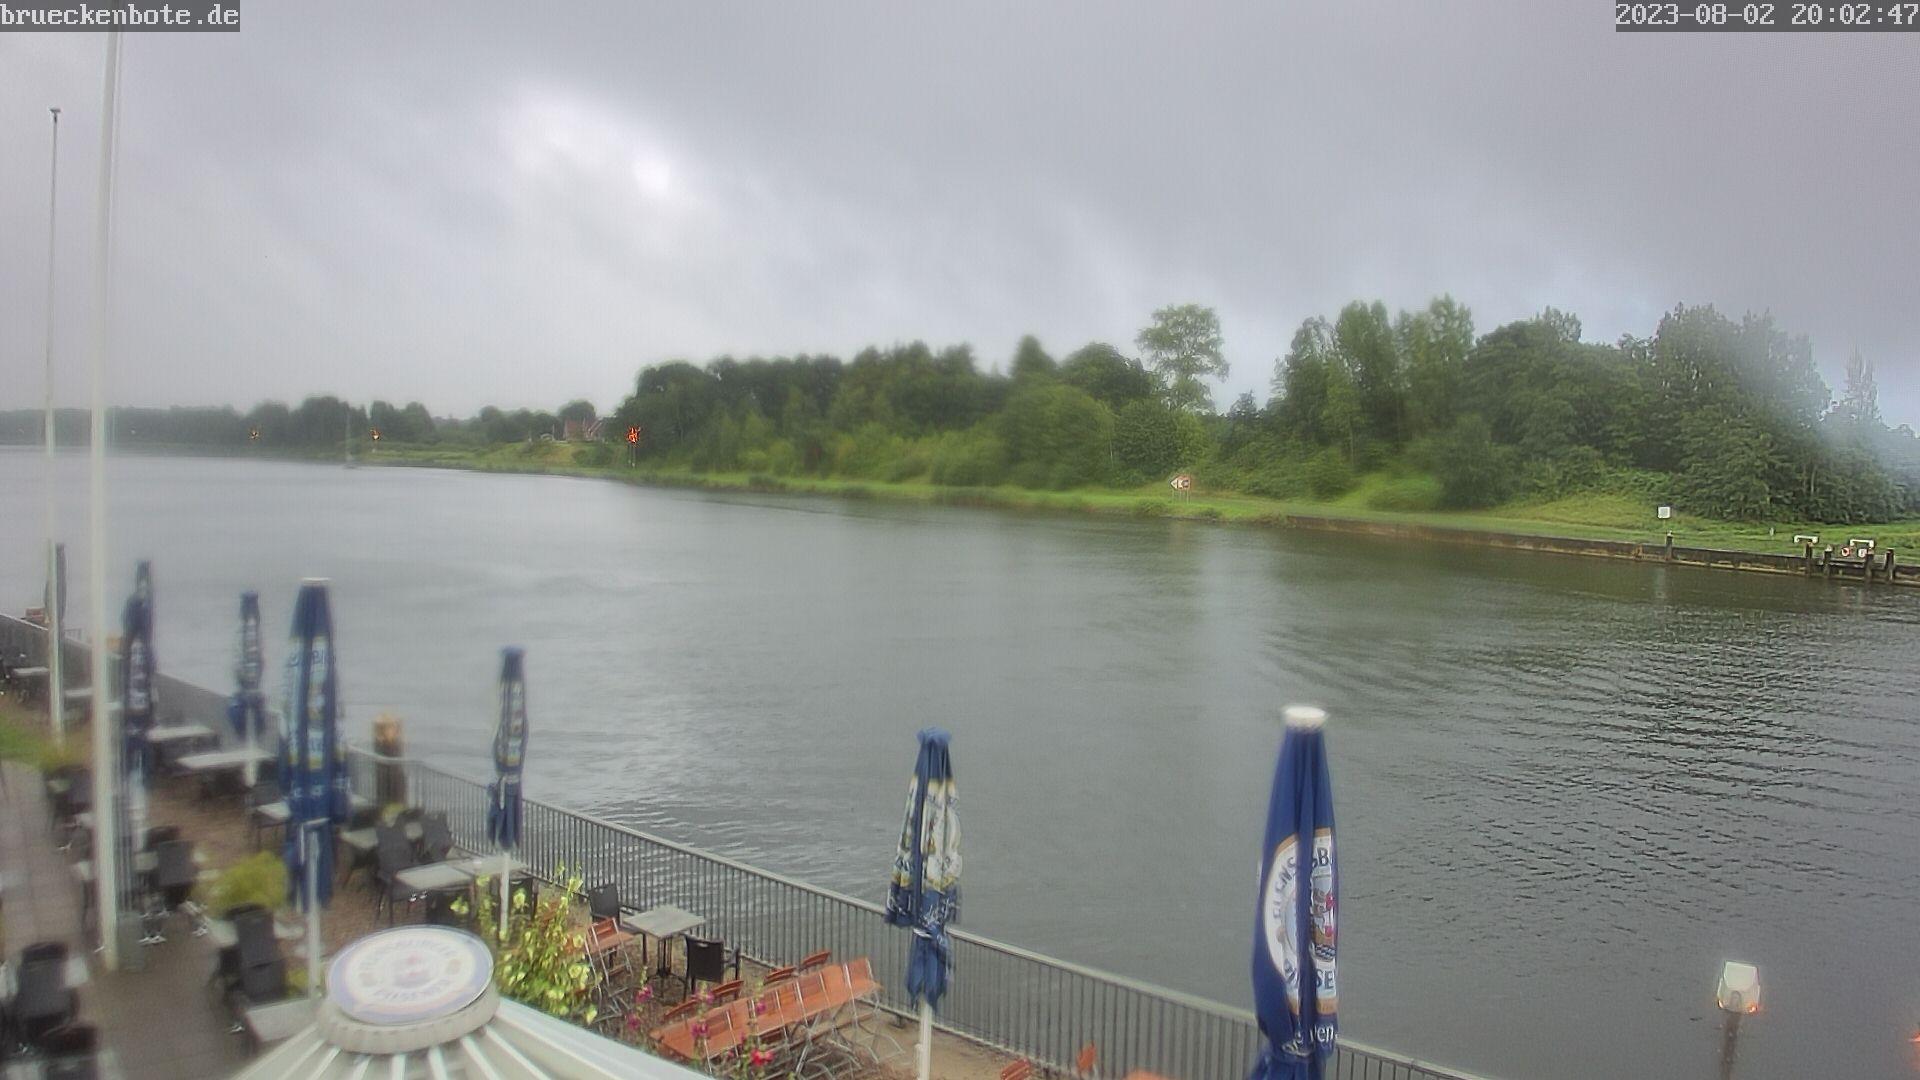 Brückenbote Rendsburg (Eisenbahnhochbrücke)